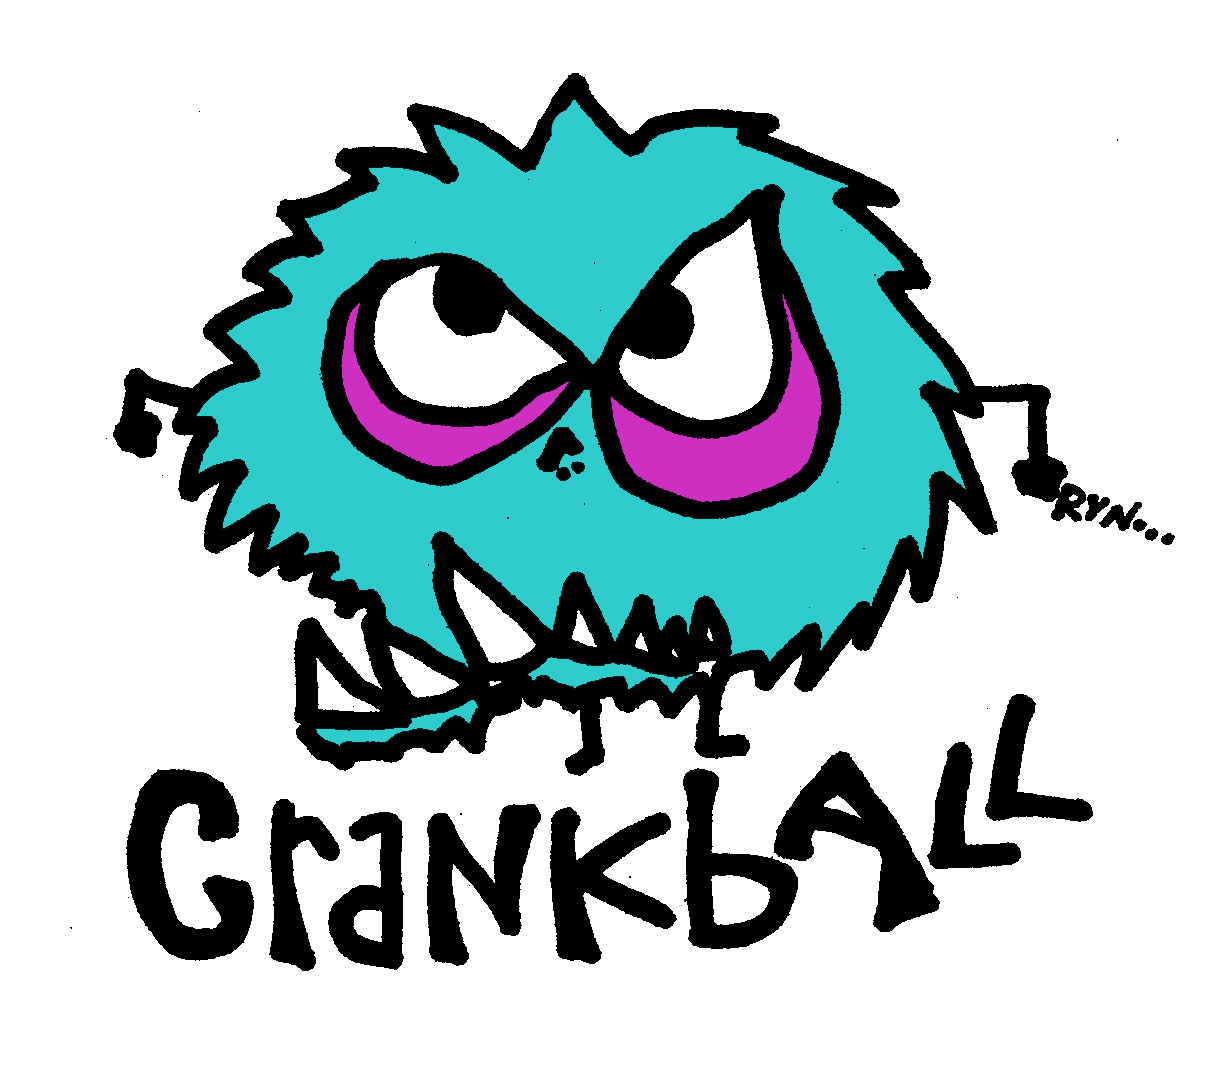 jiminy crankball cause of crankiness